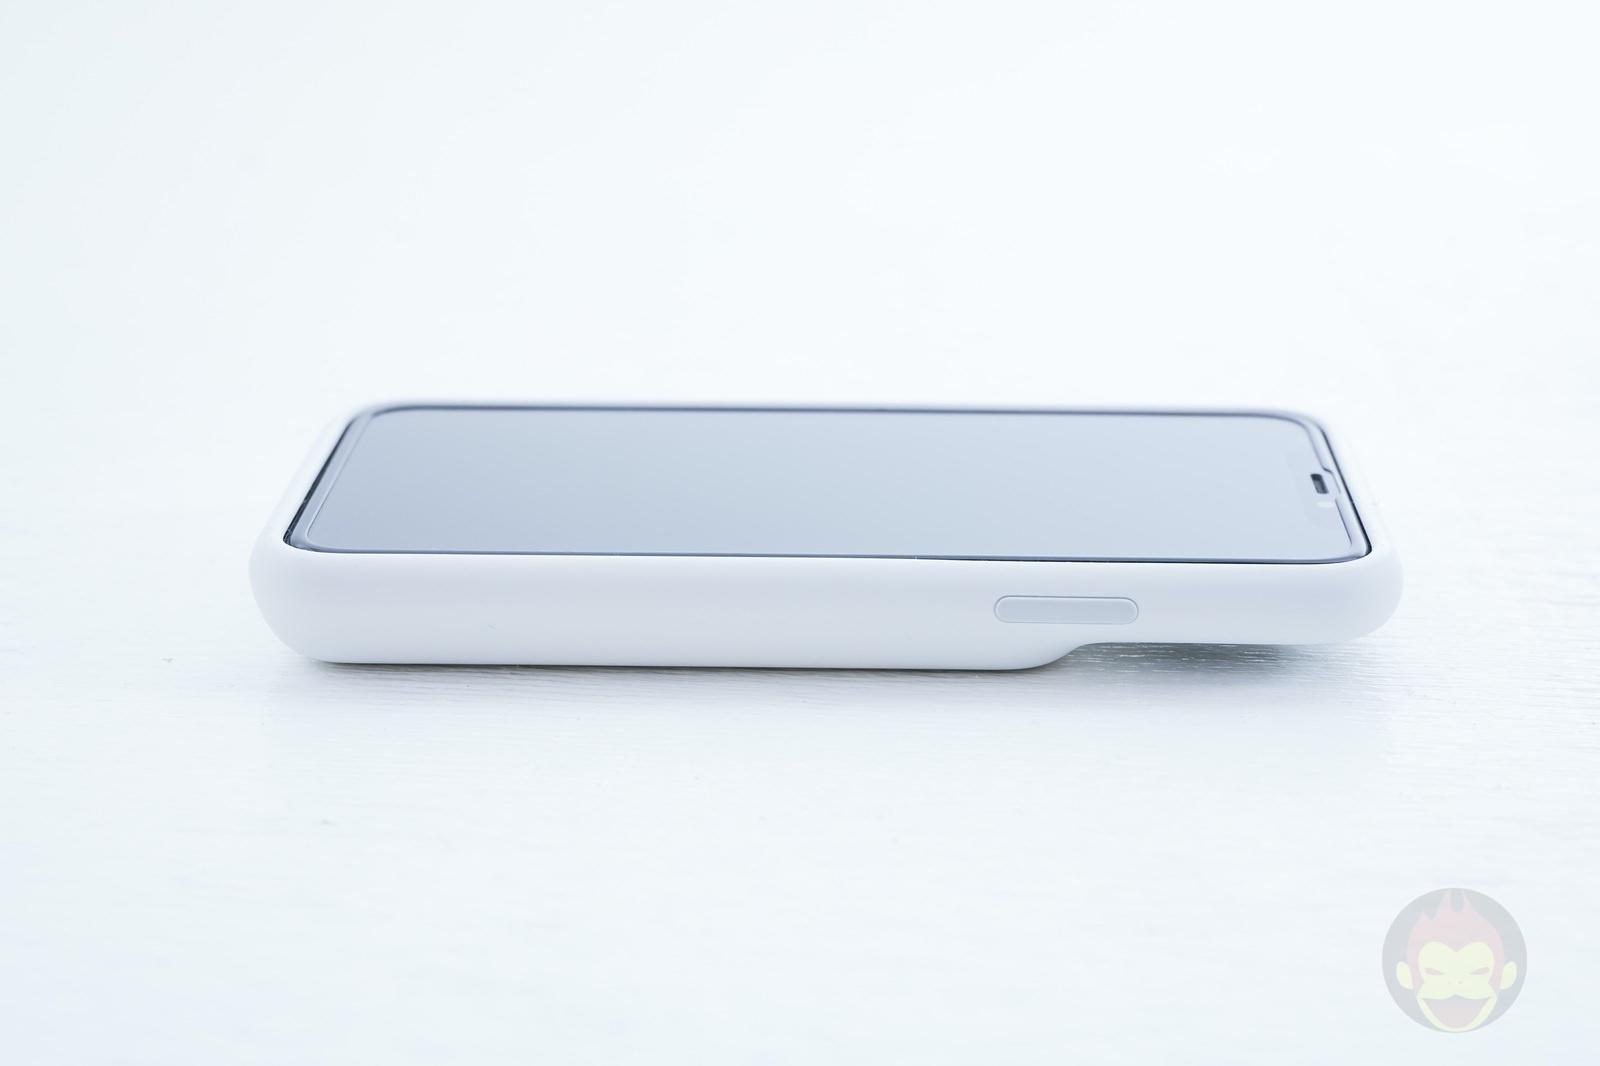 Smart-Battery-Case-for-iPhoneXS-Review-03.jpg